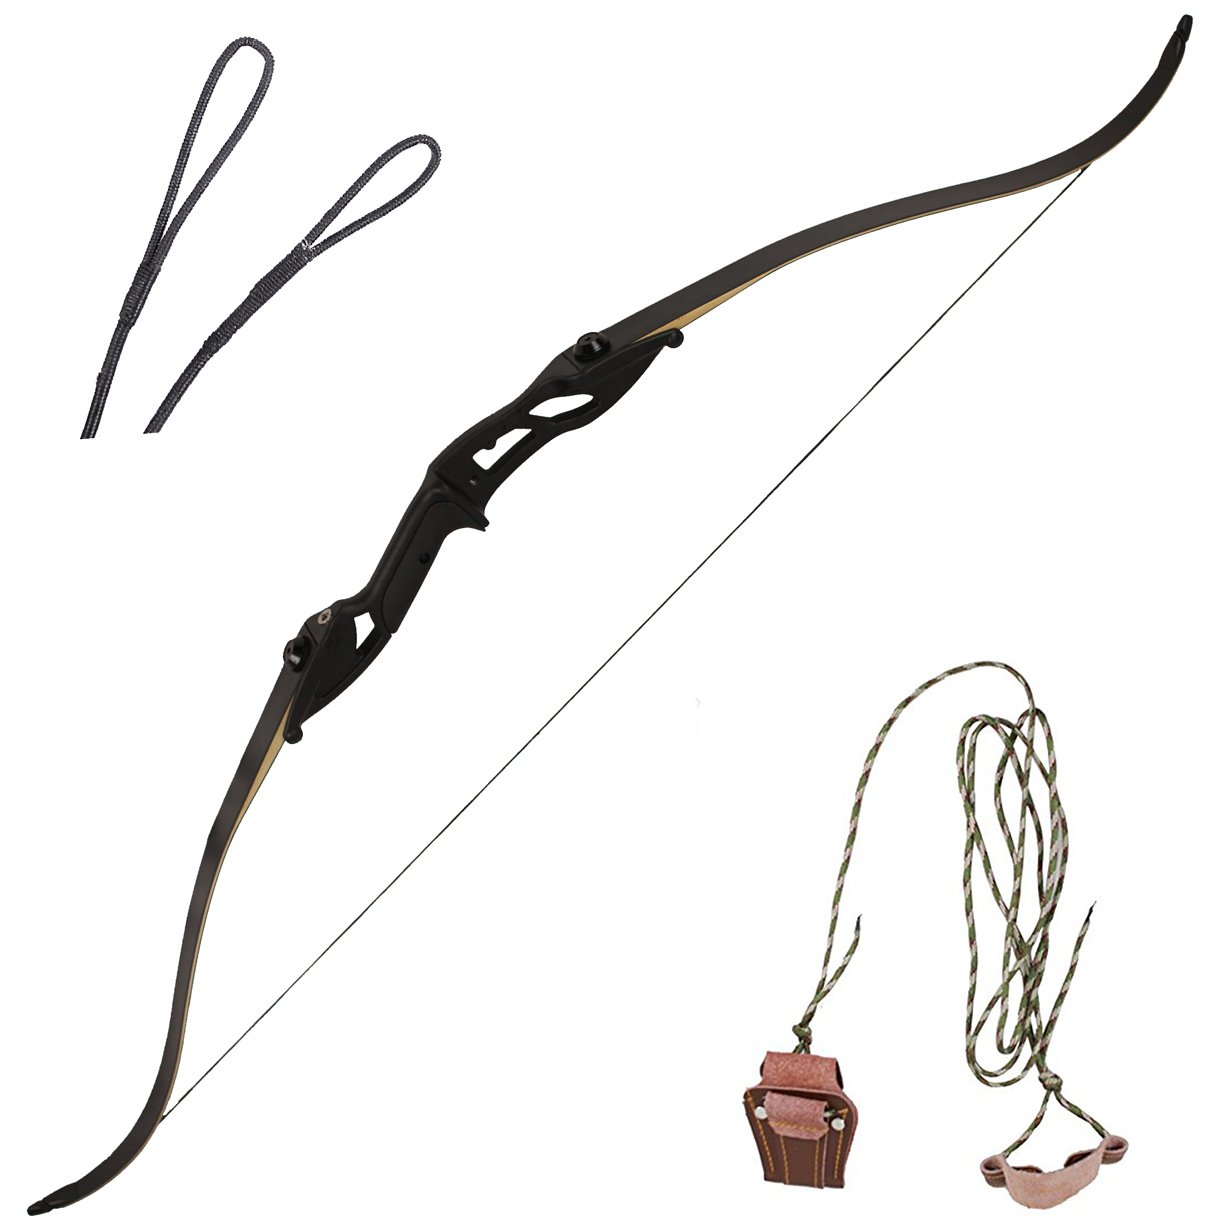 kaimei Hunter Recurve Bow Metal Riser 56 Inch 30-50 lbs Black Right Hand Long Bow Hunting Target (30lb)